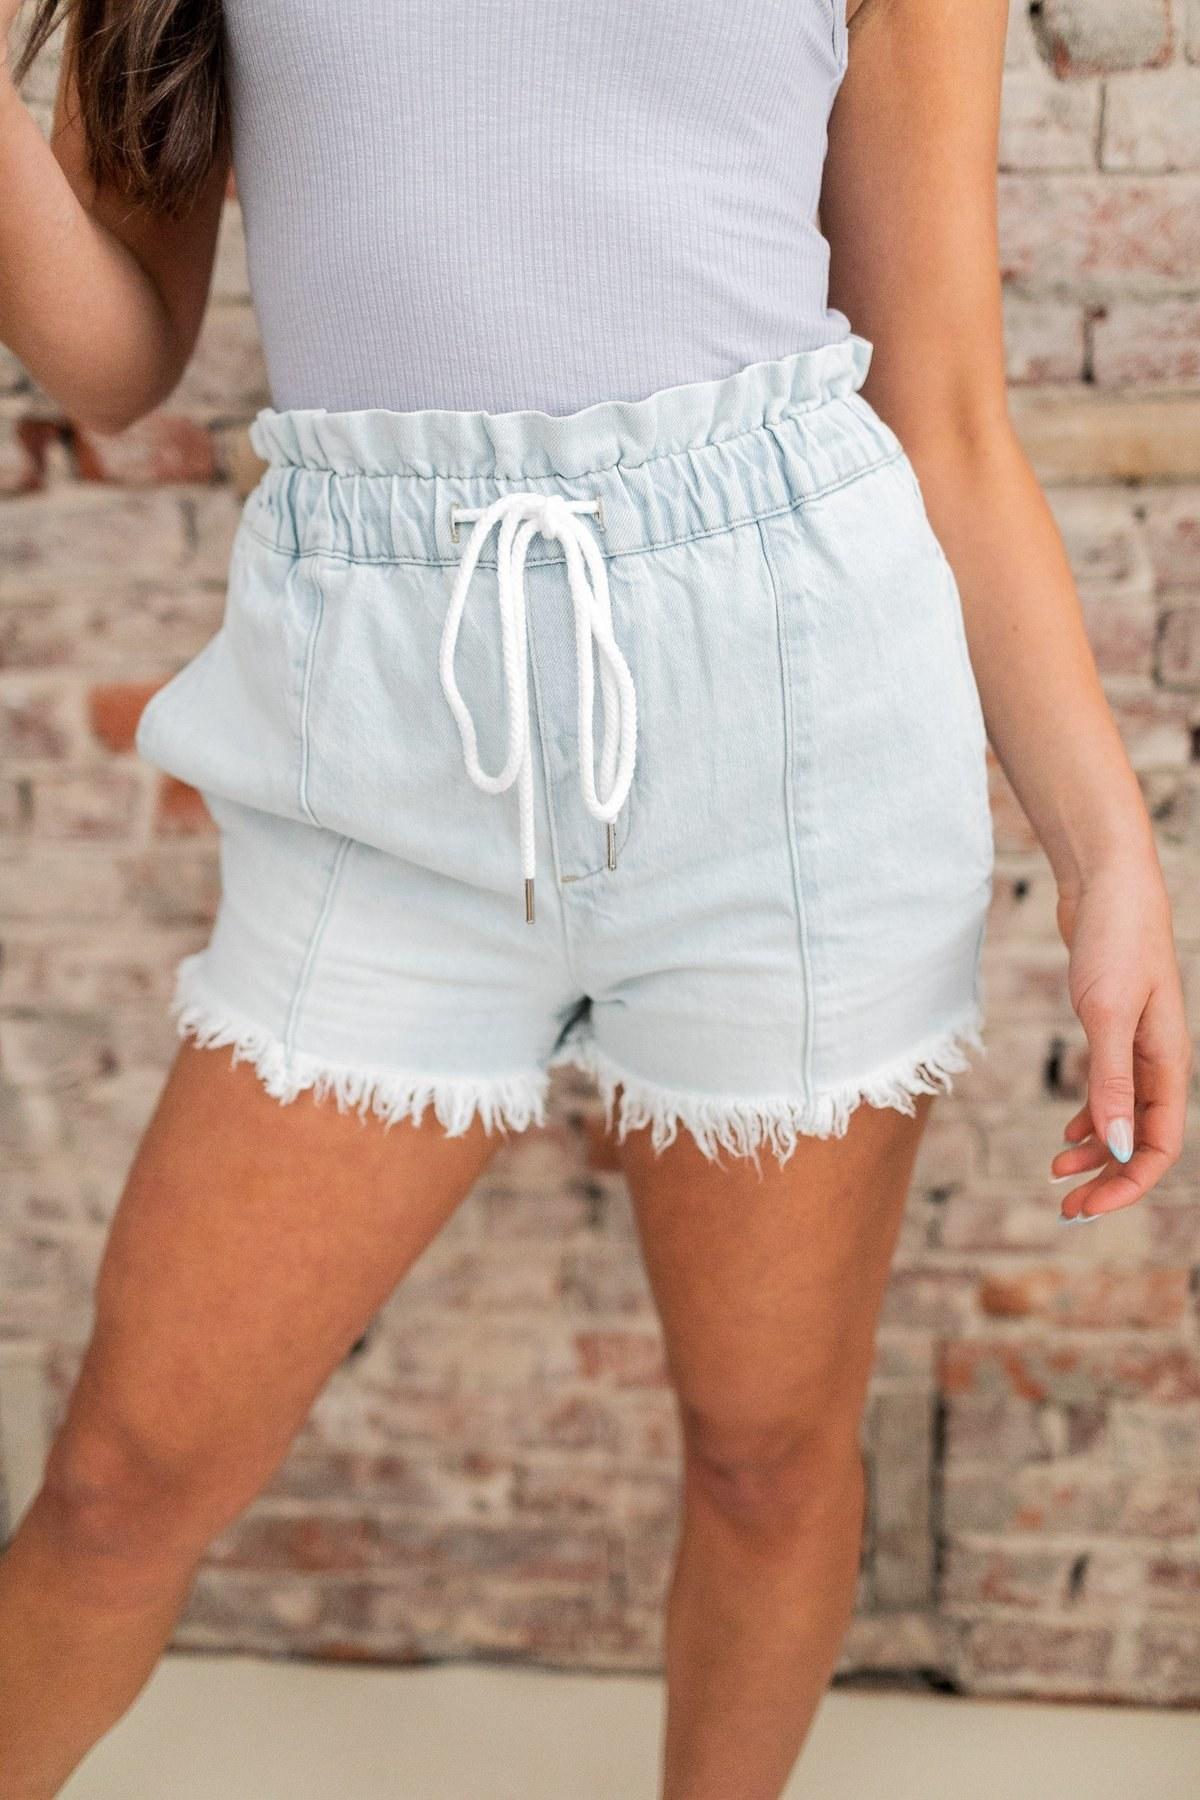 a model wearing the elastic waist fringe denim shorts